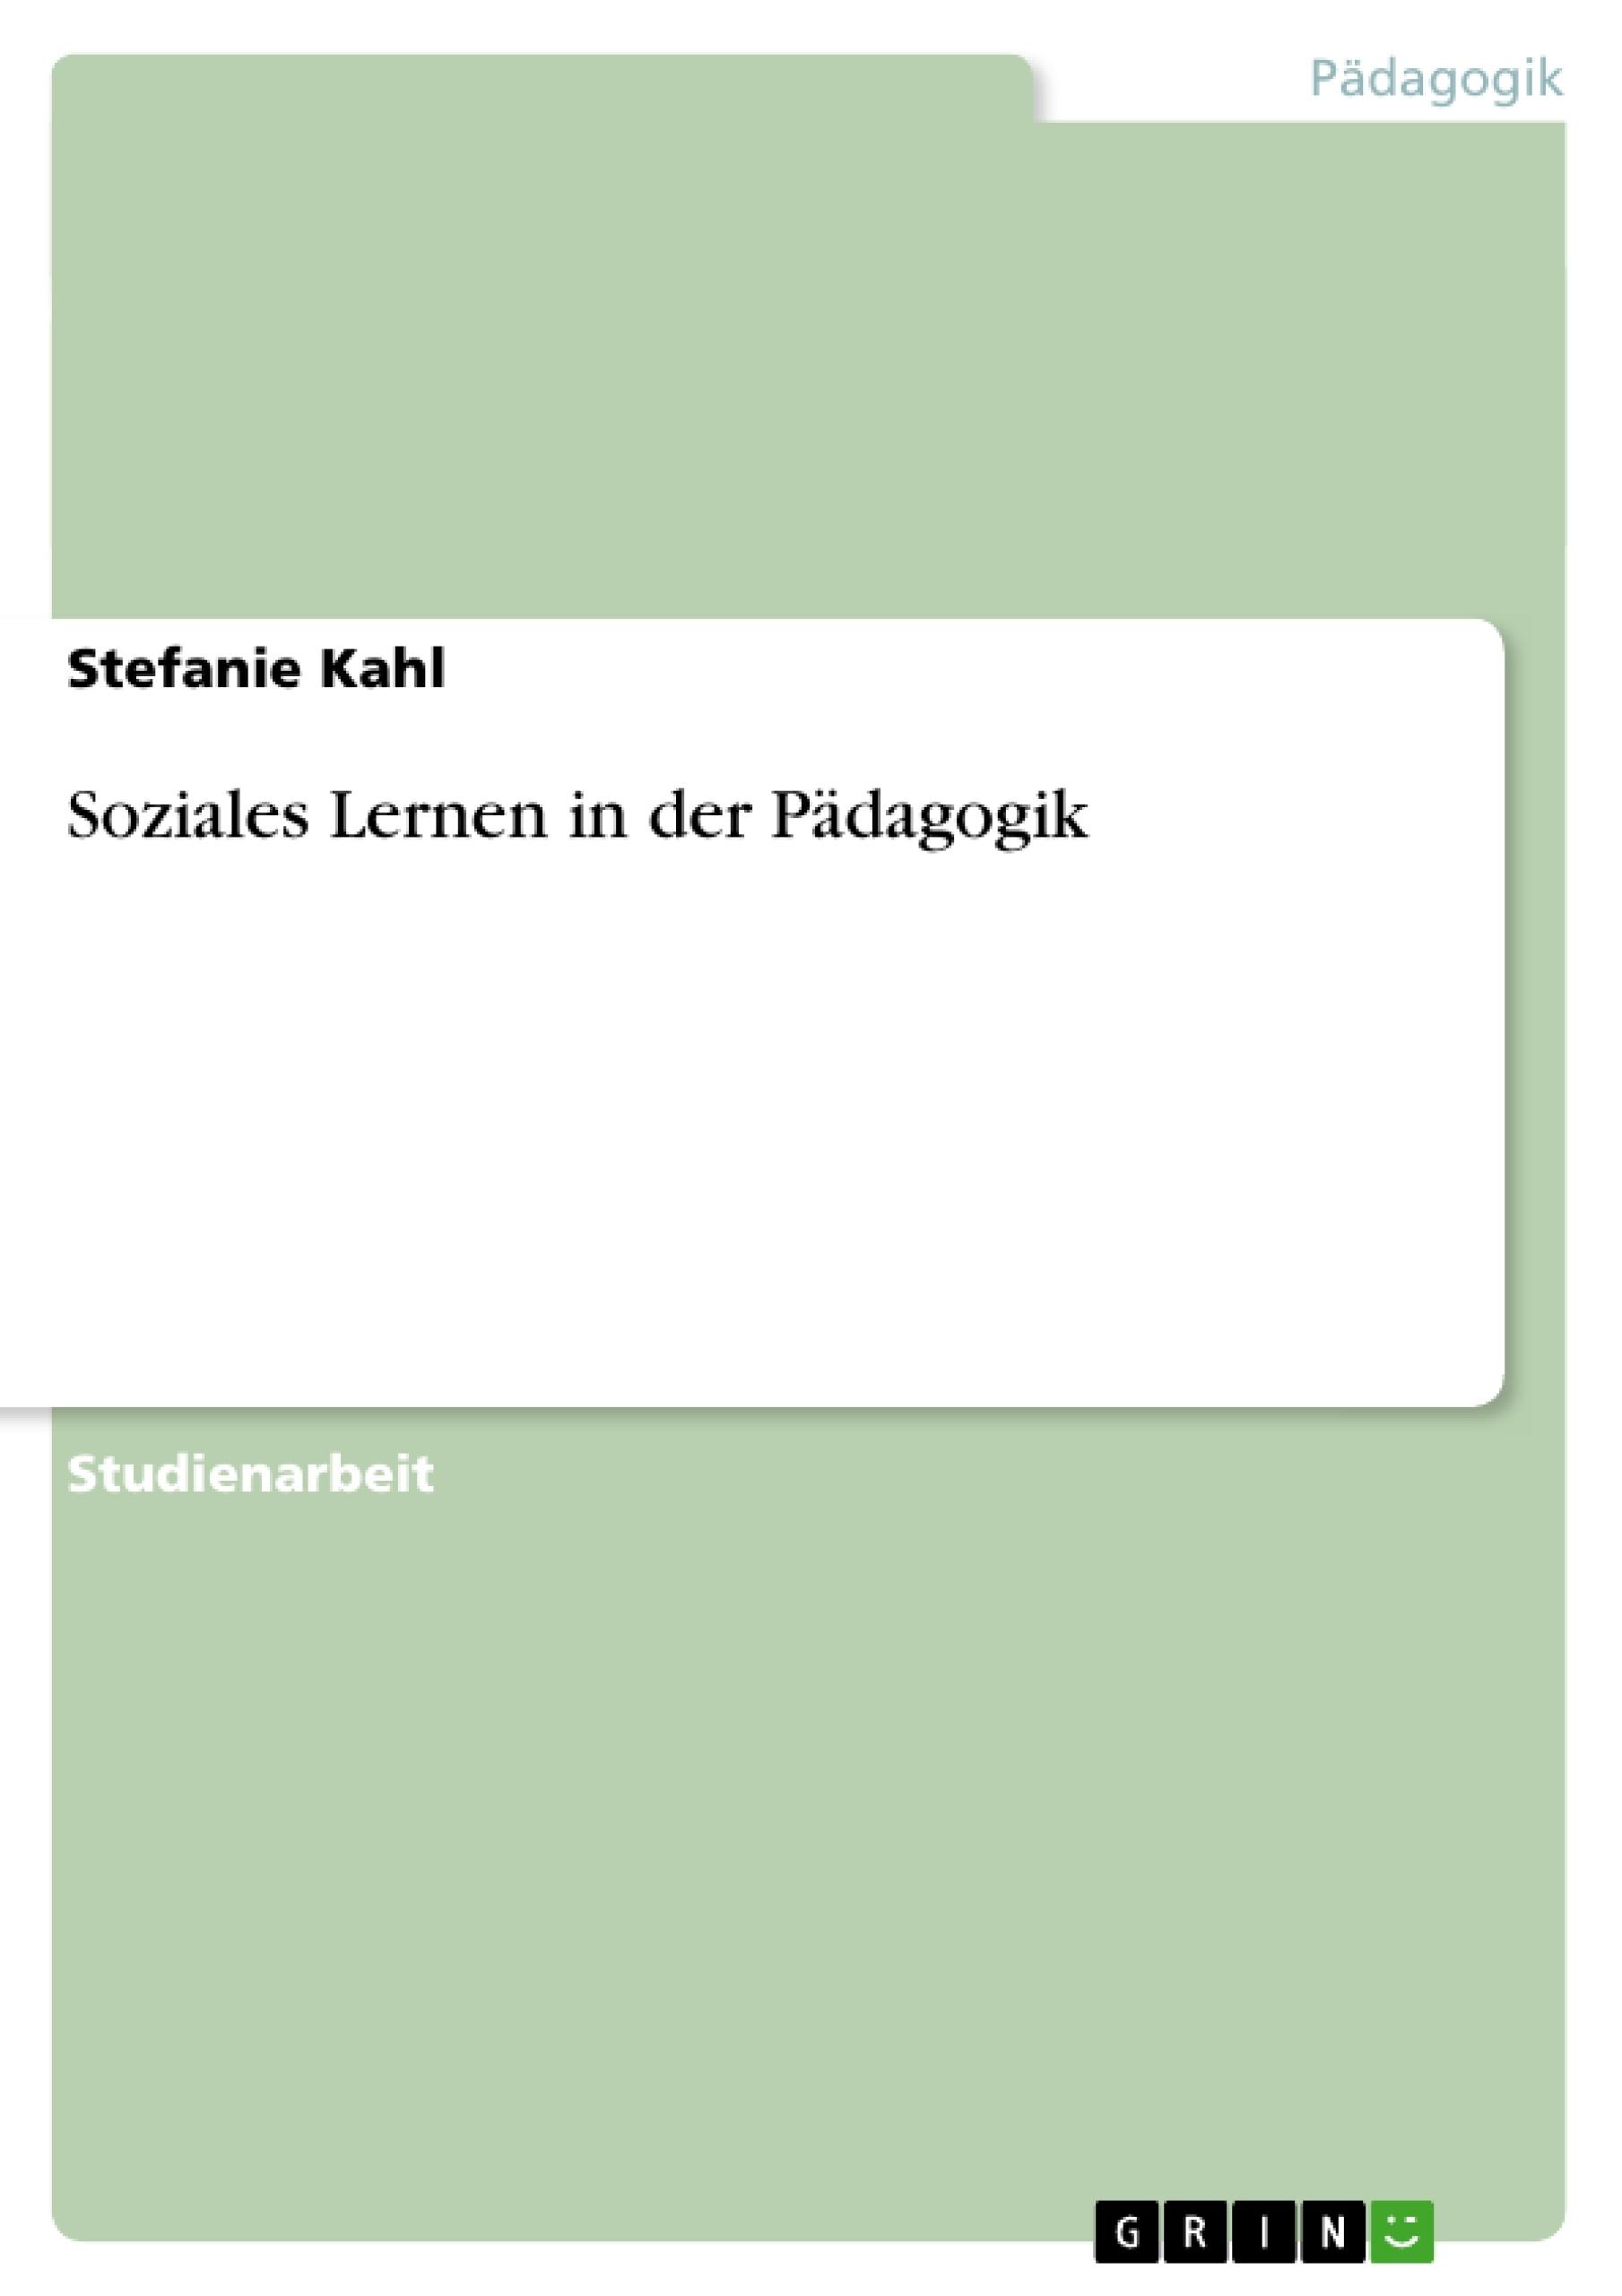 Titel: Soziales Lernen in der Pädagogik